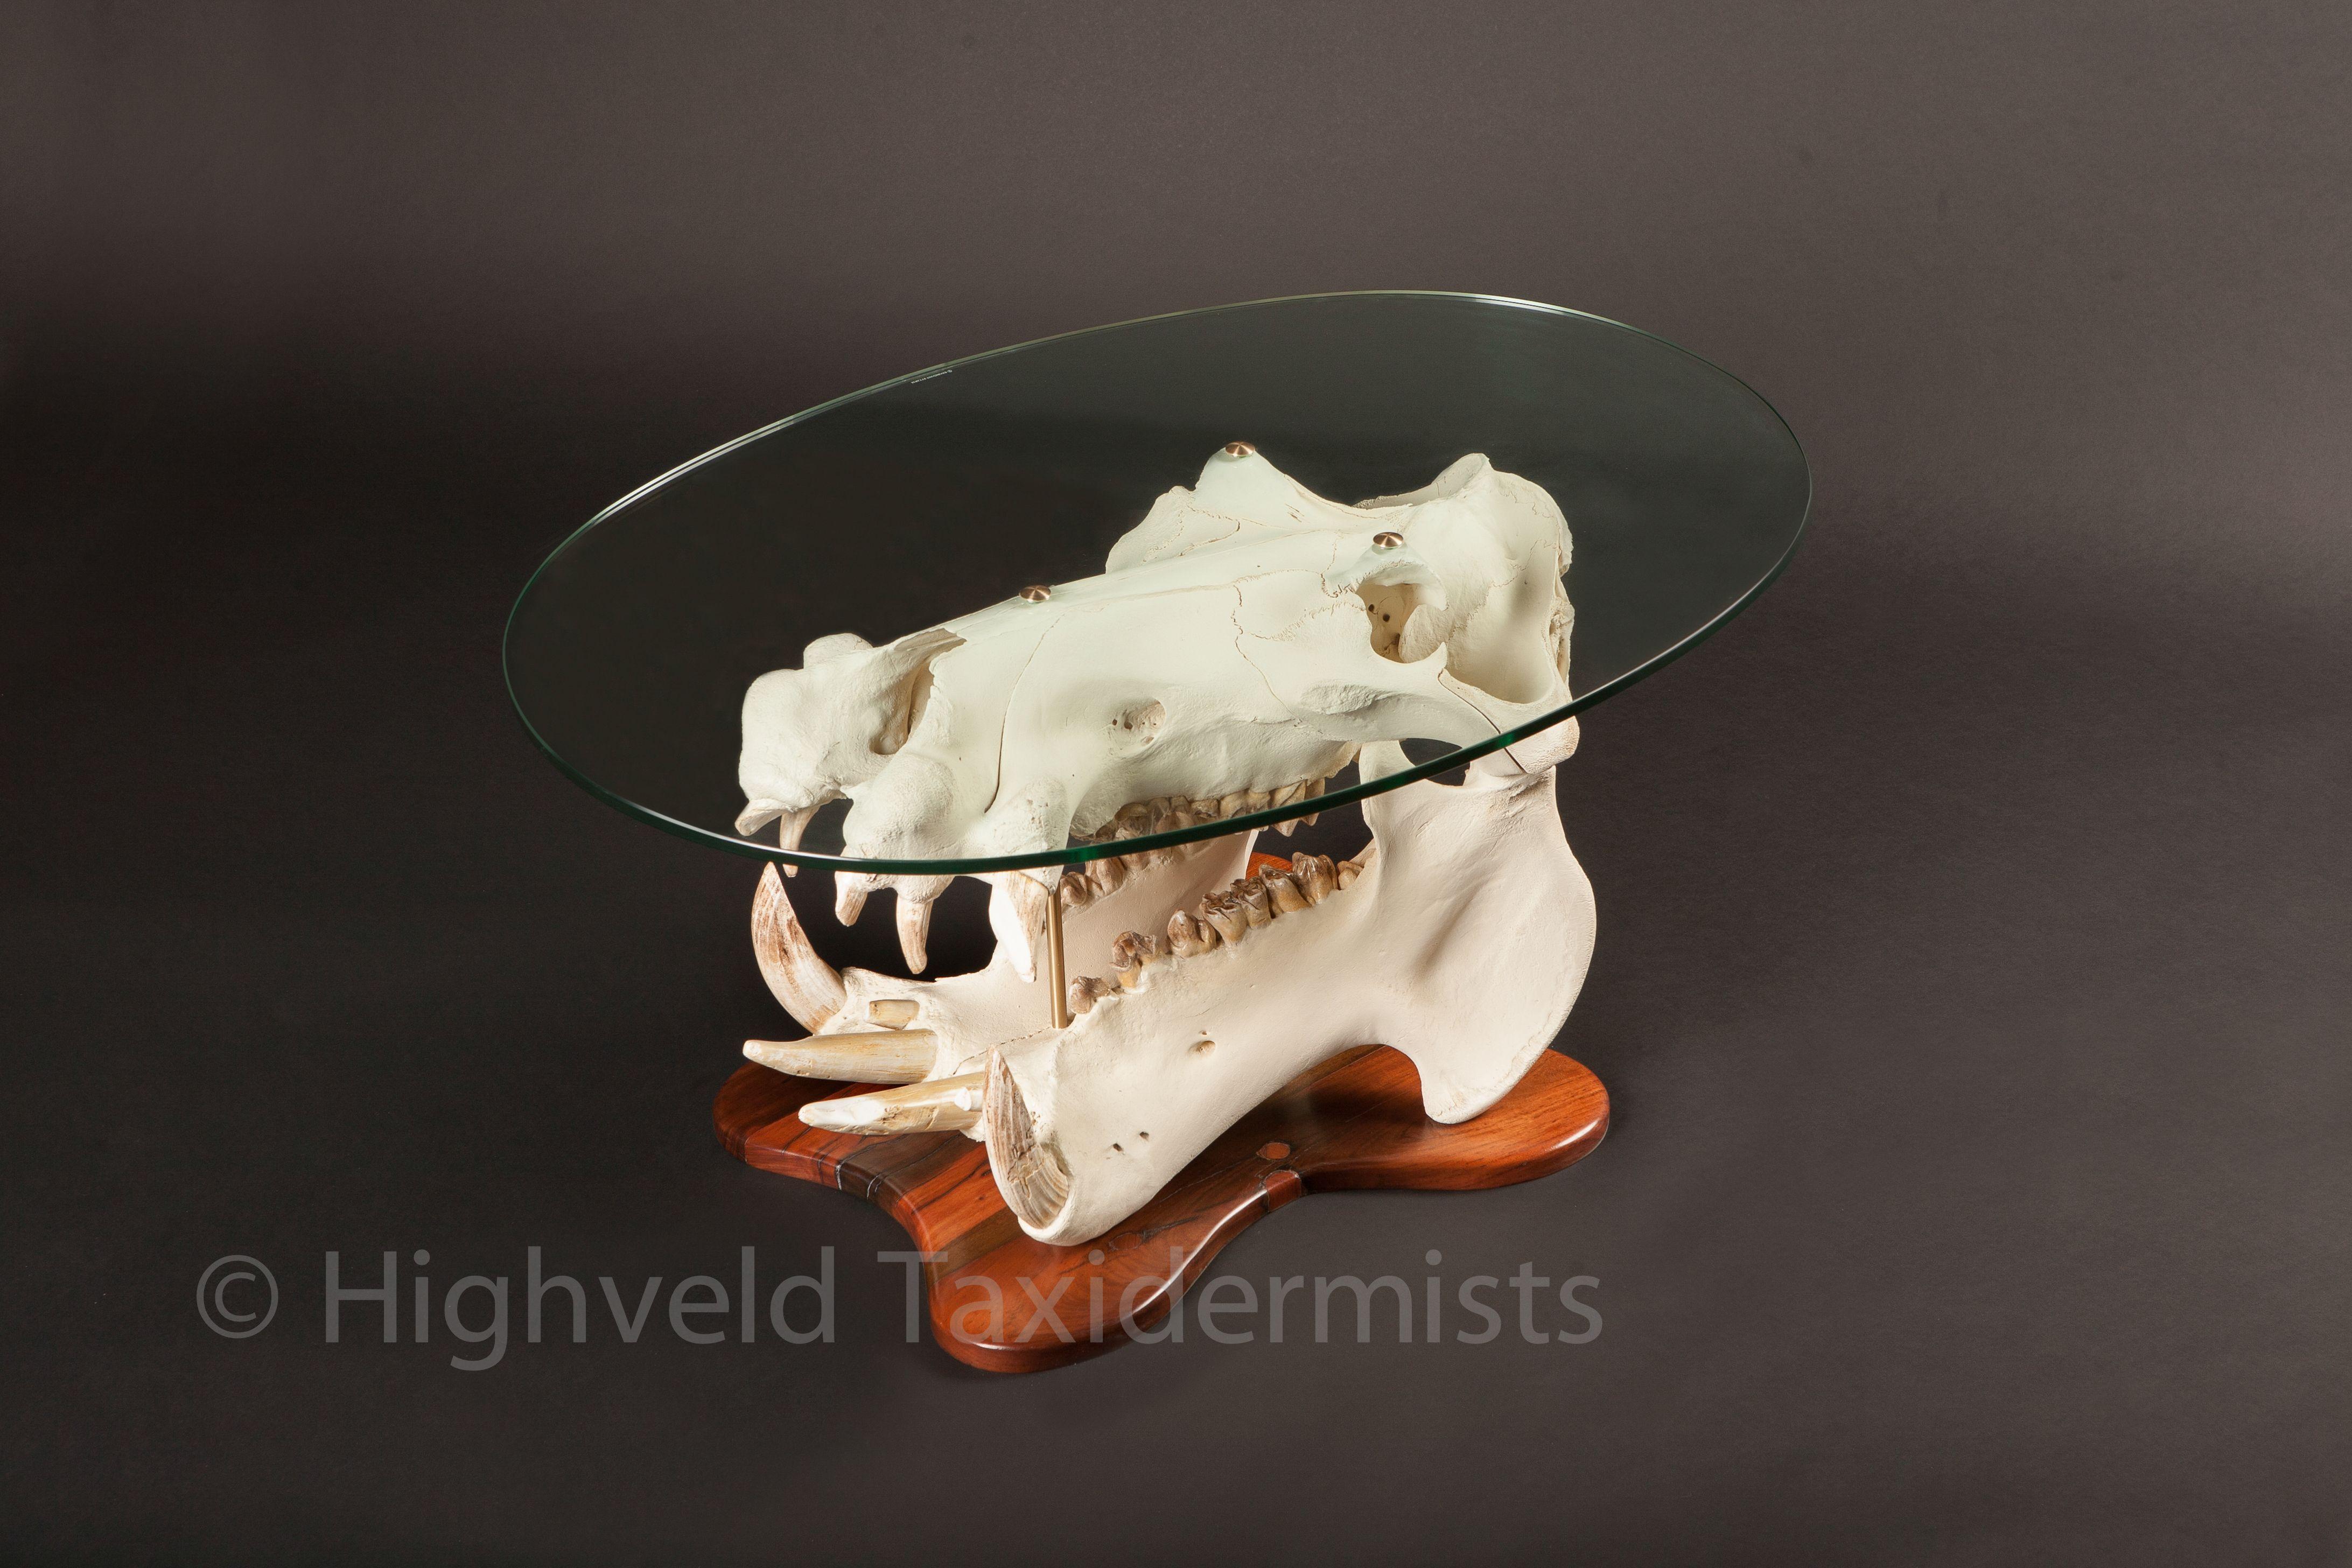 Hippo Skull Coffee Table Highveldtaxidermists Skullart Taxidermyart Taxidermy Taxidermy Art Taxidermist Taxidermy [ 2912 x 4368 Pixel ]